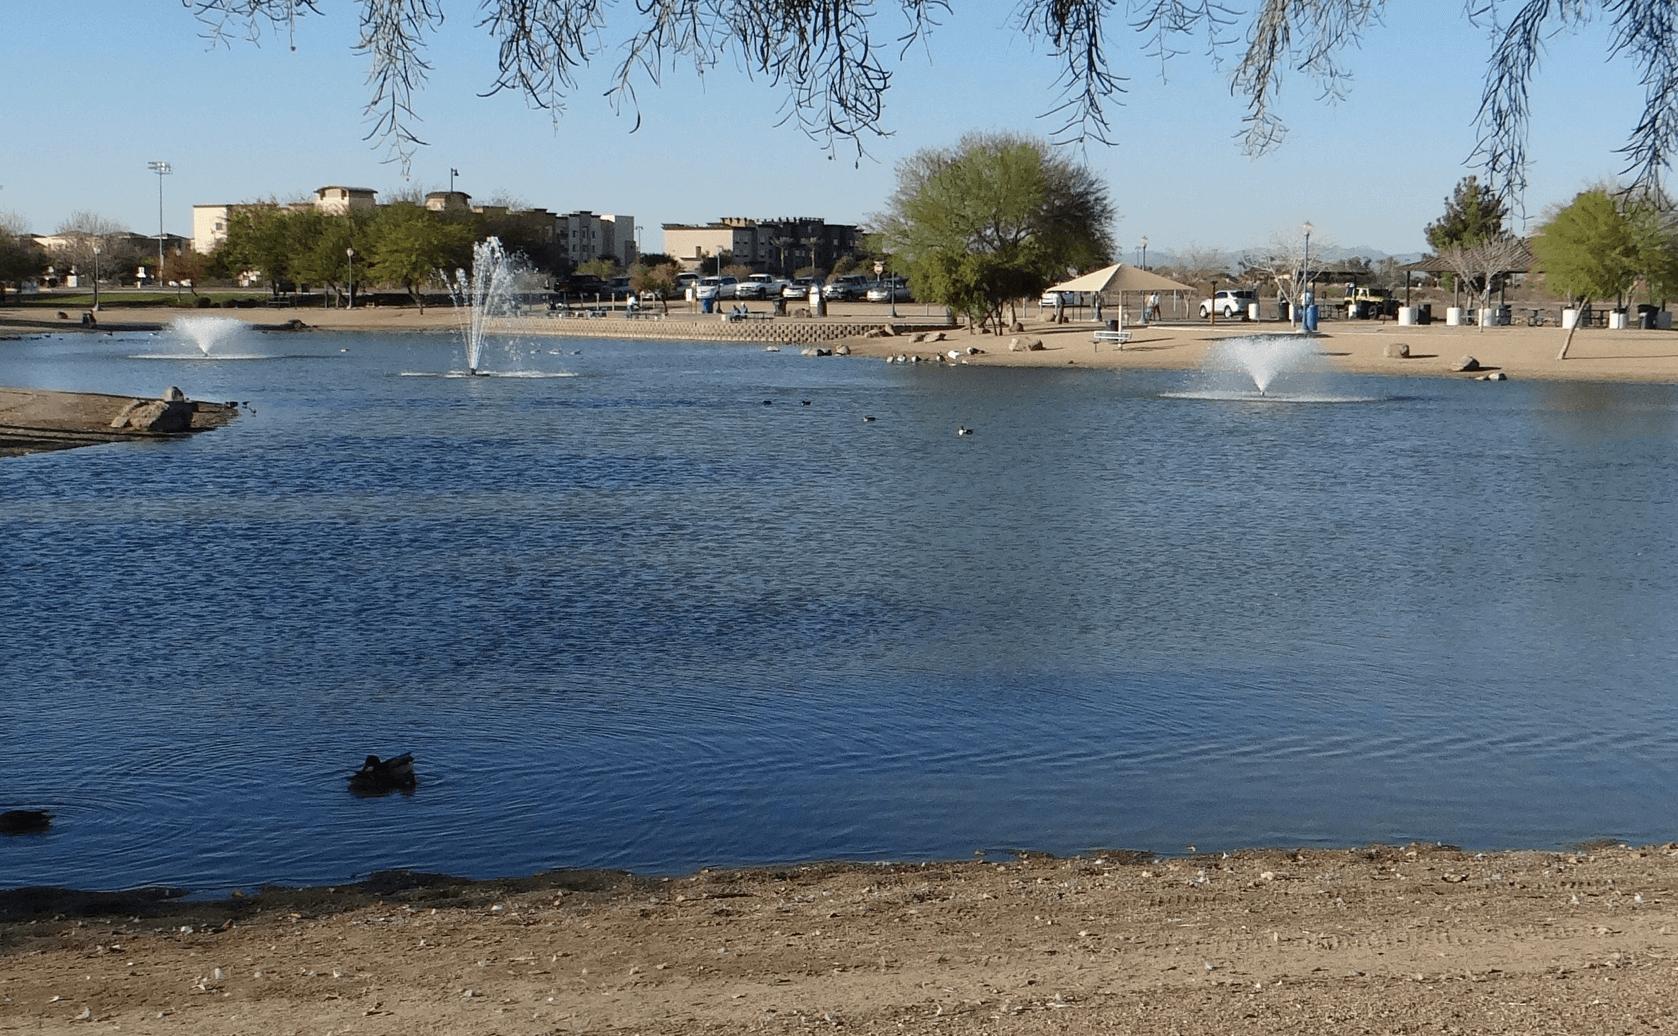 Surprise-Community-Lake-Fishing-Guide-Peoria-AZ-01